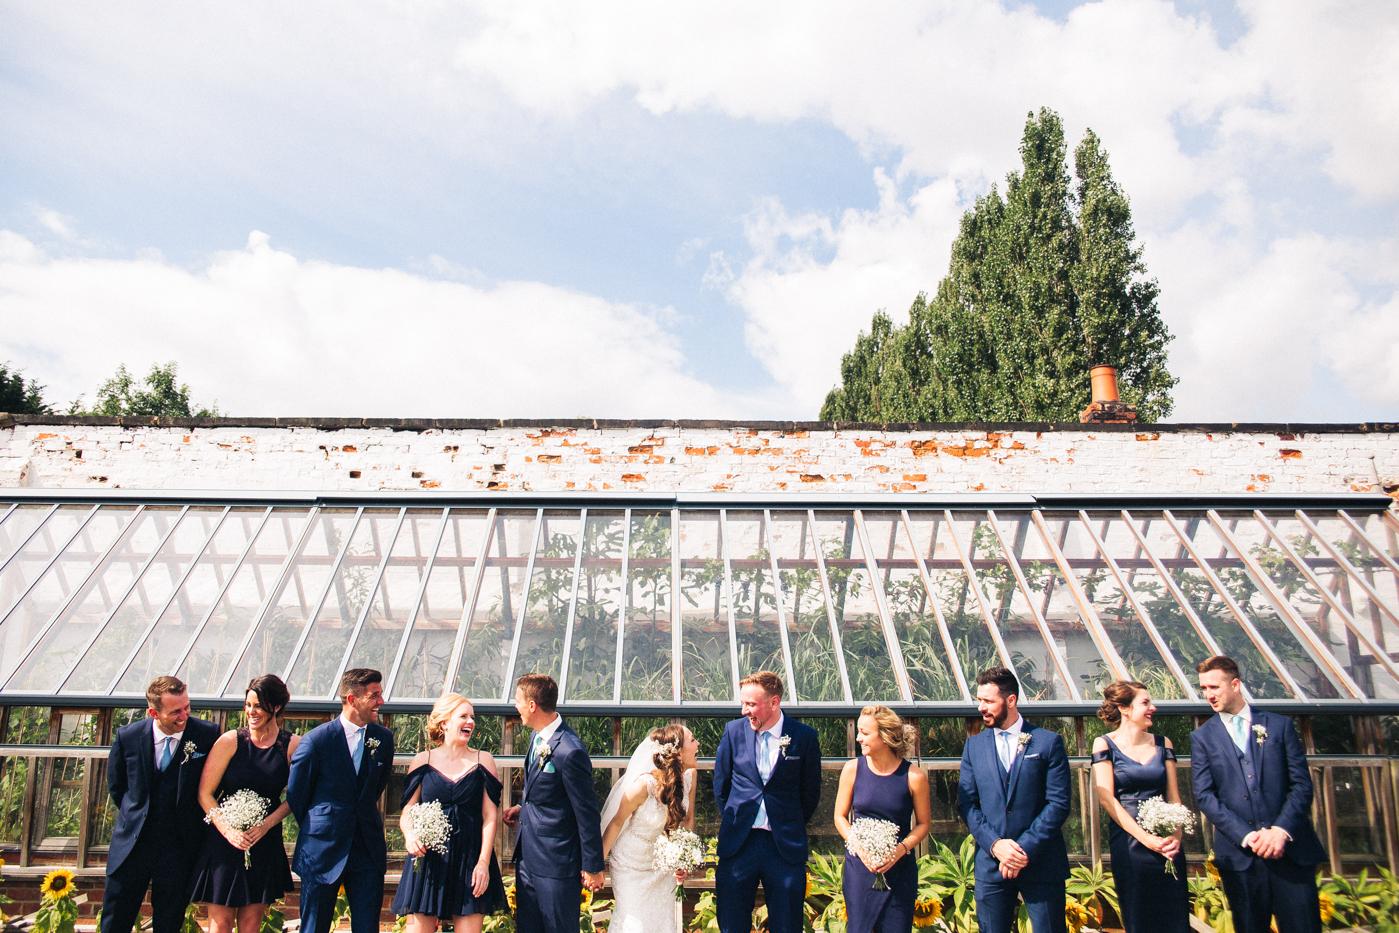 teesside-middlesbrough-north-east-wedding-photographer-creative-wedding-venues-0133.jpg